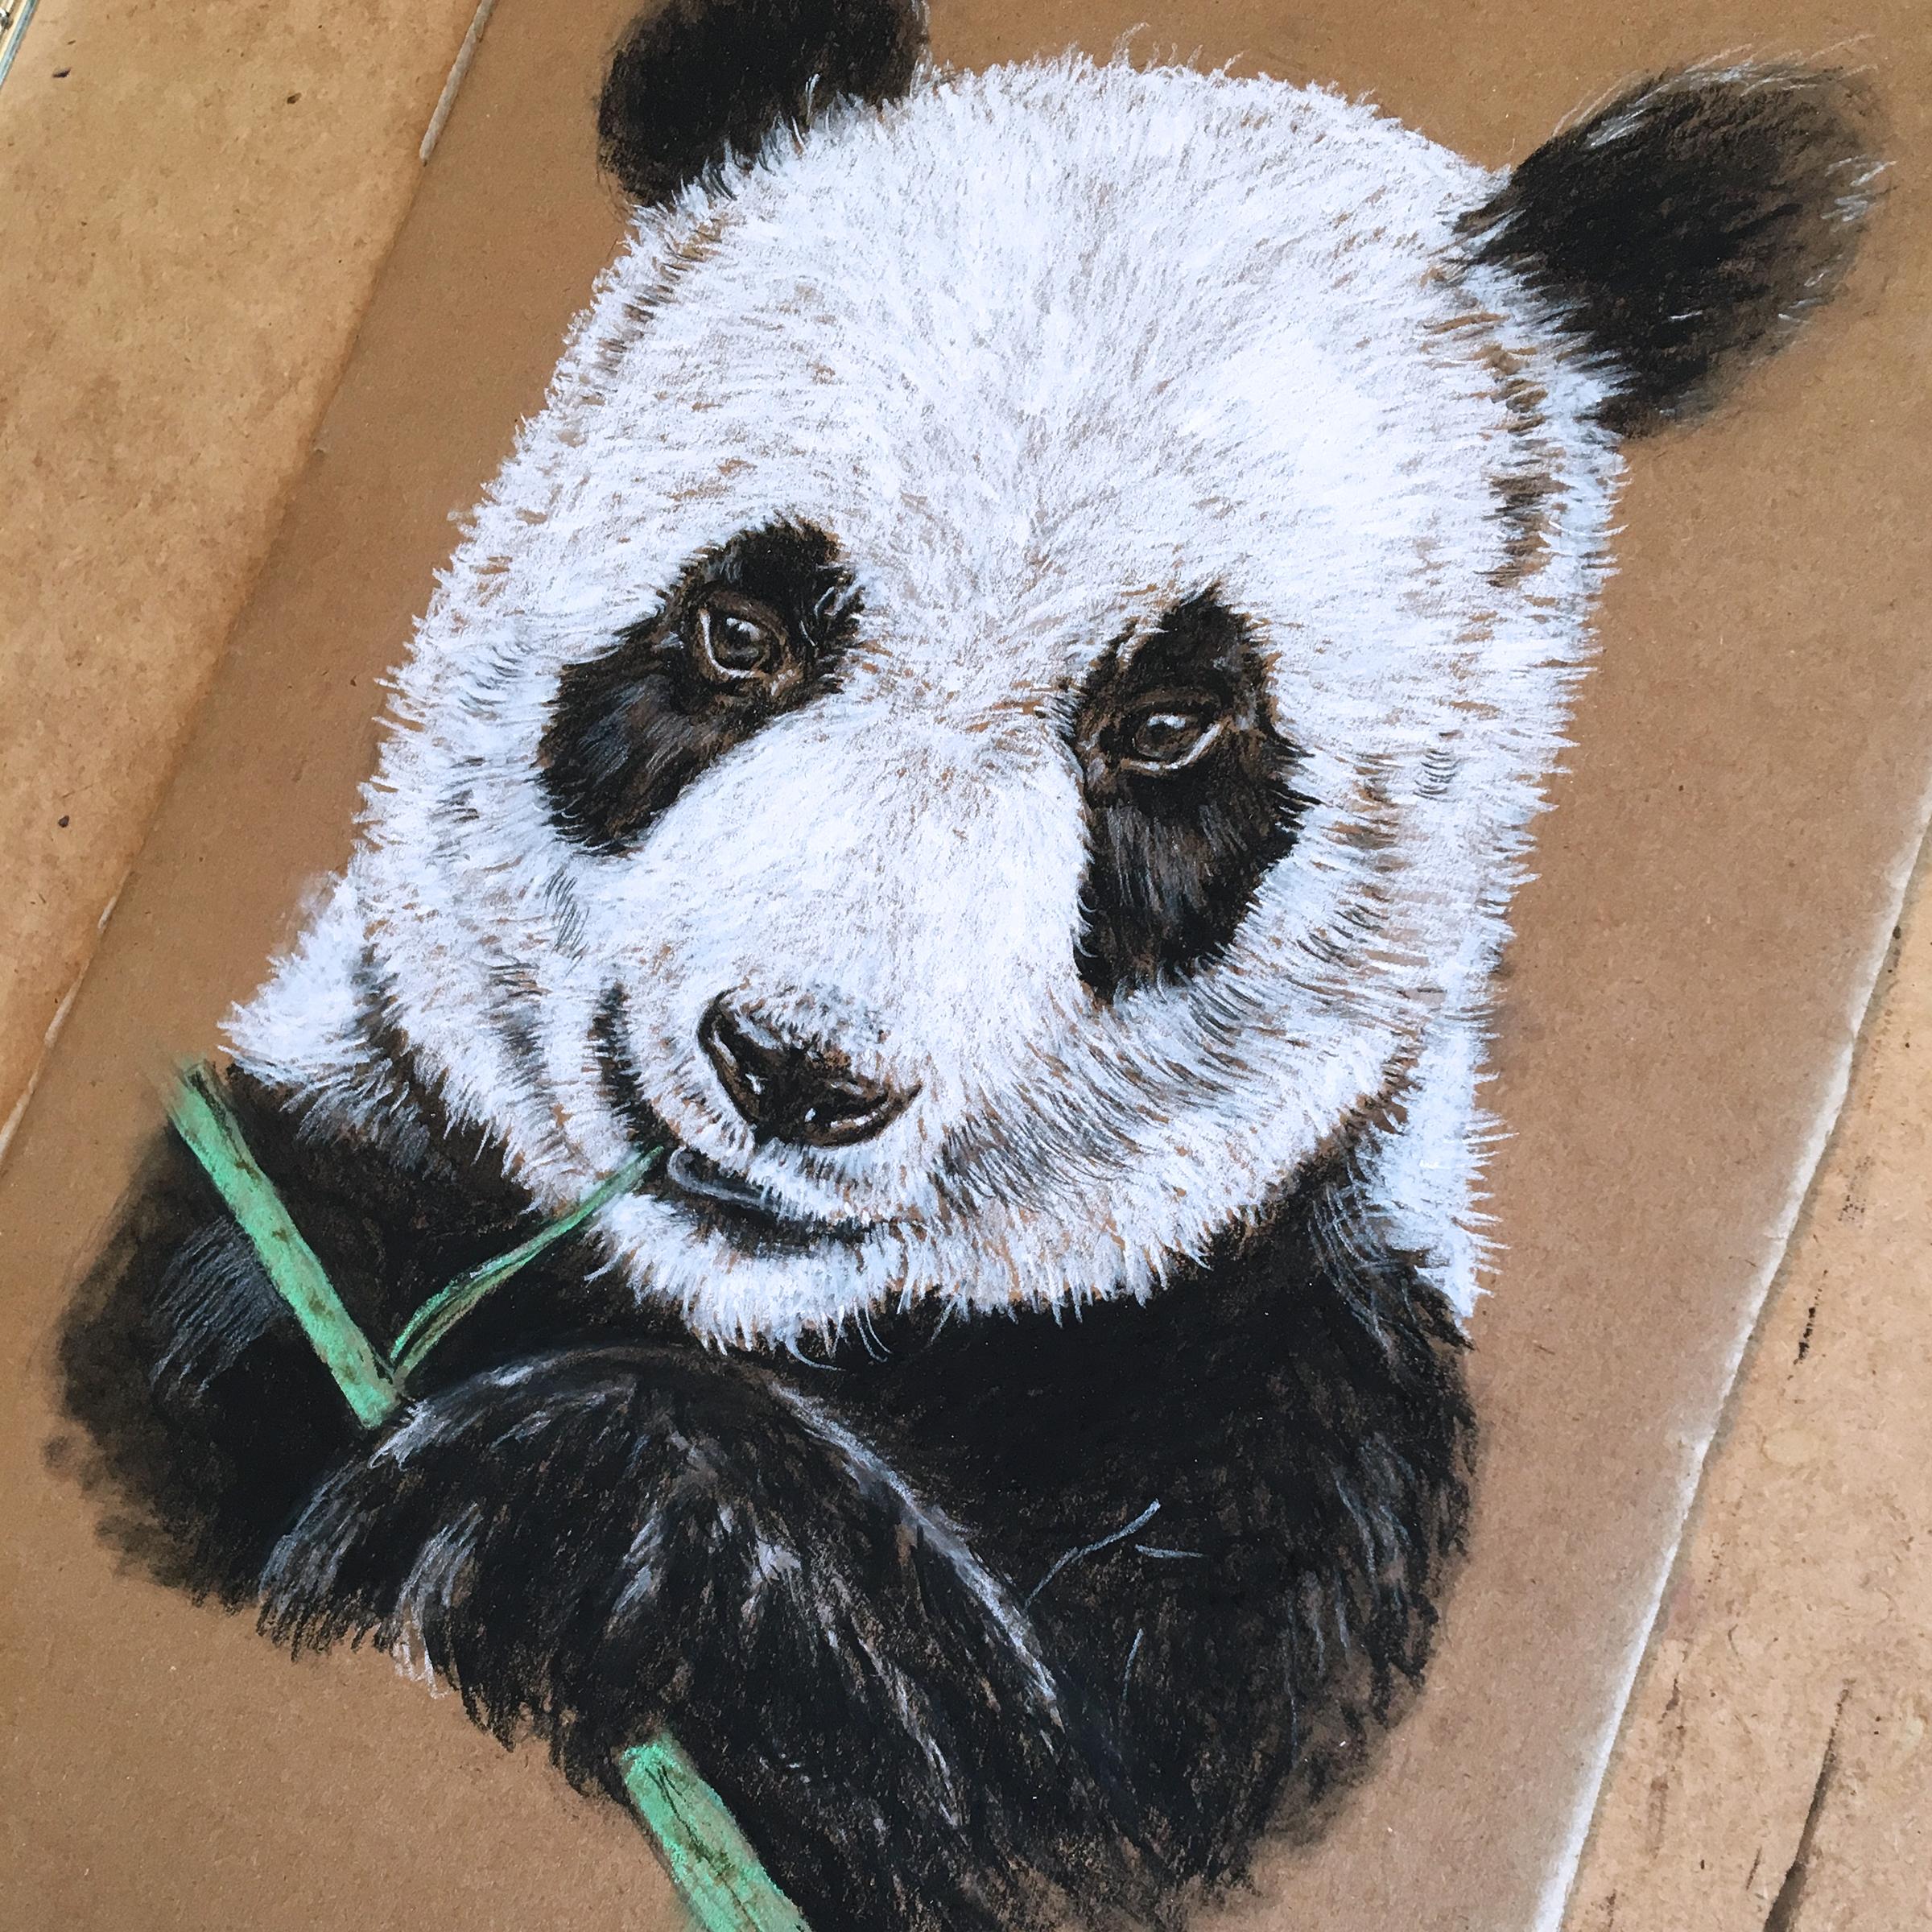 cardboard-art-charcoal-panda-sketch-by-jordan-fretz-3.jpg